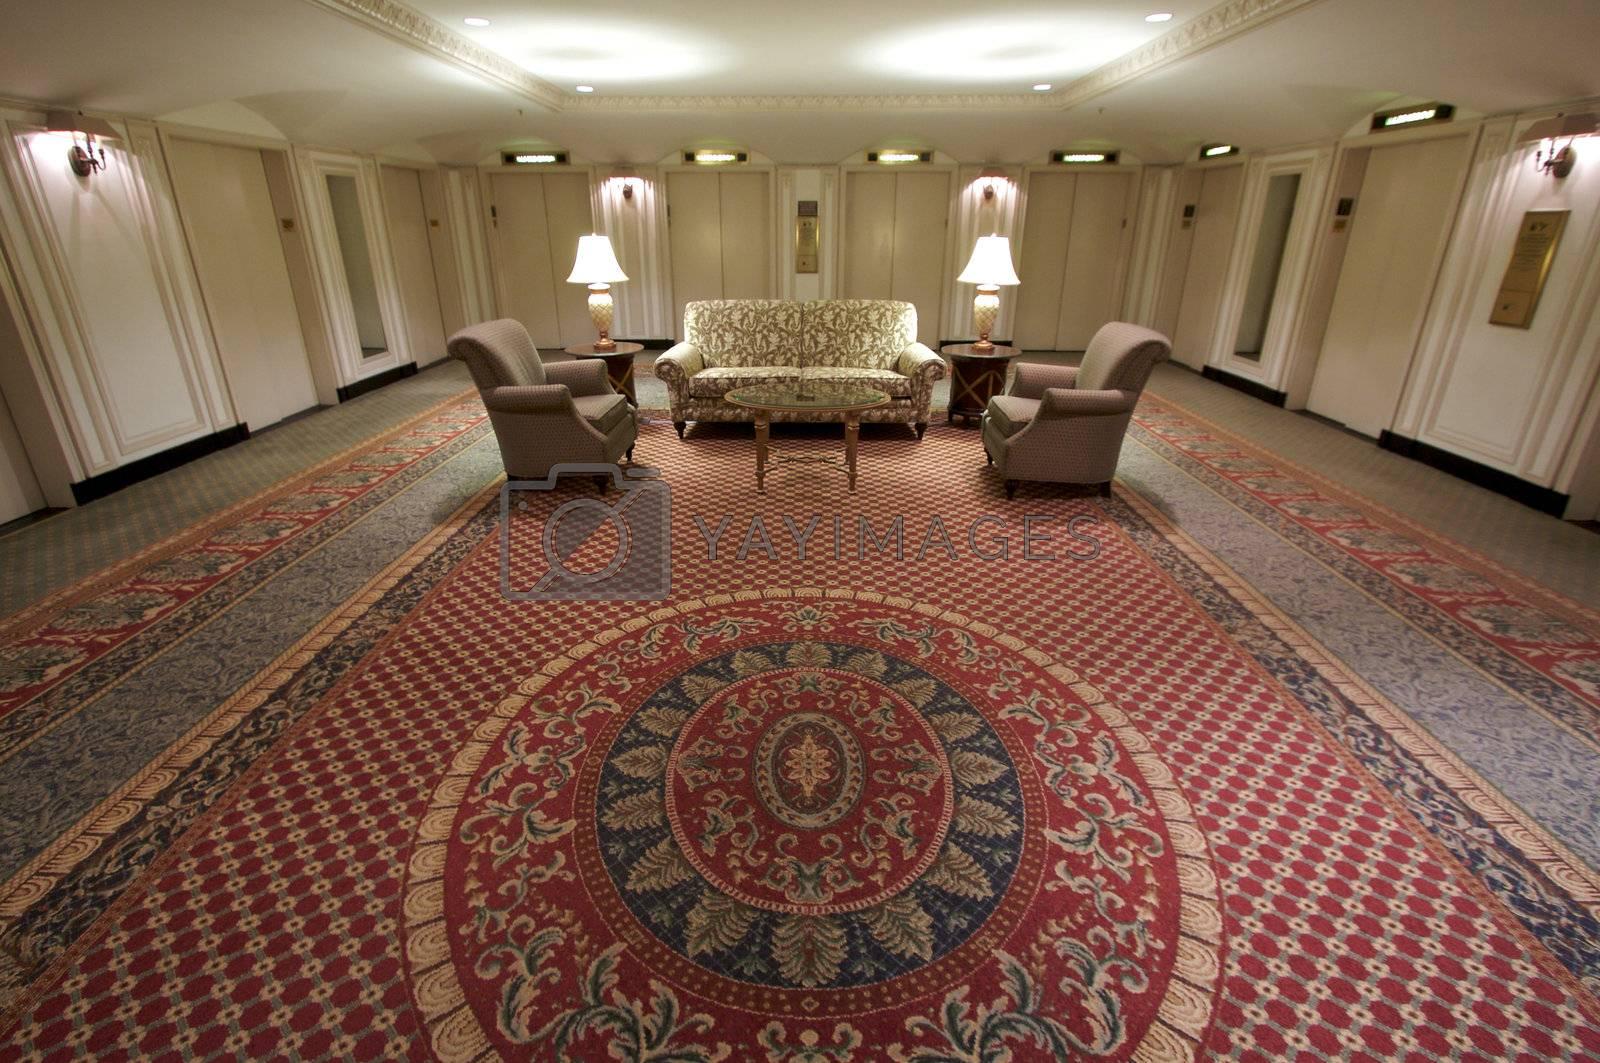 Classic Elevator Lobby Interior of a Hotel